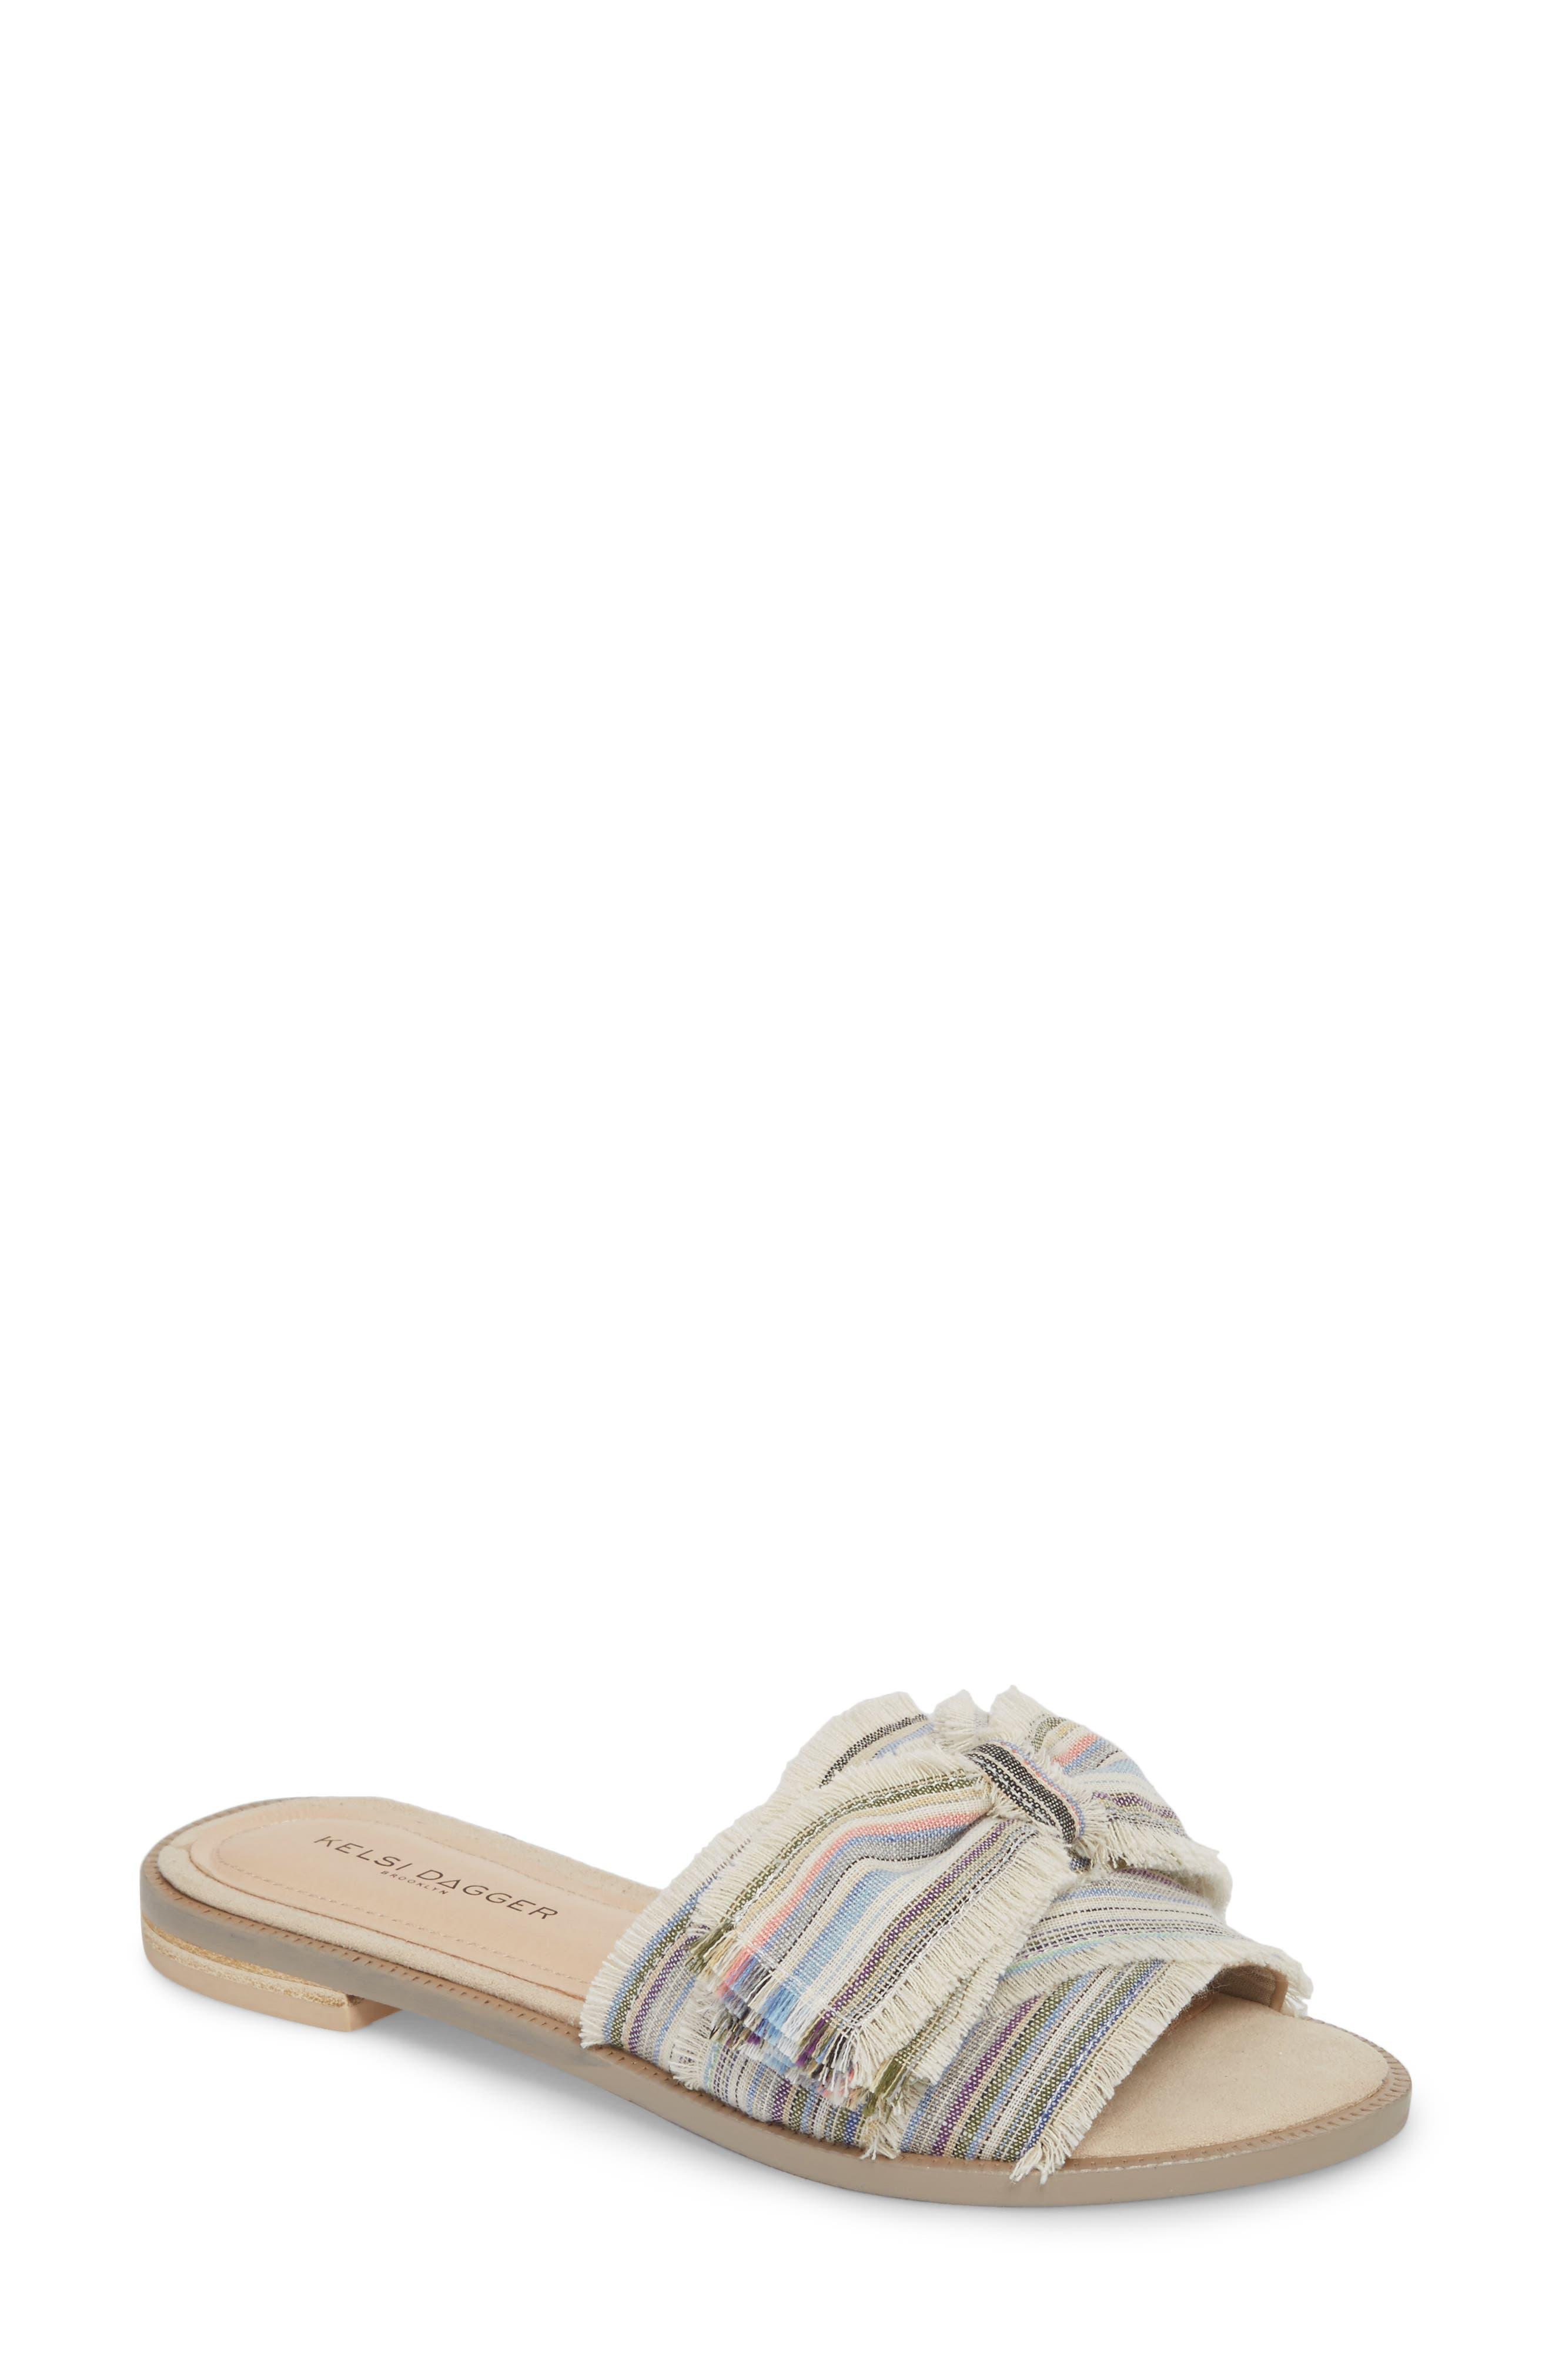 Revere Bow Slide Sandal,                             Main thumbnail 1, color,                             Bone/ Multi